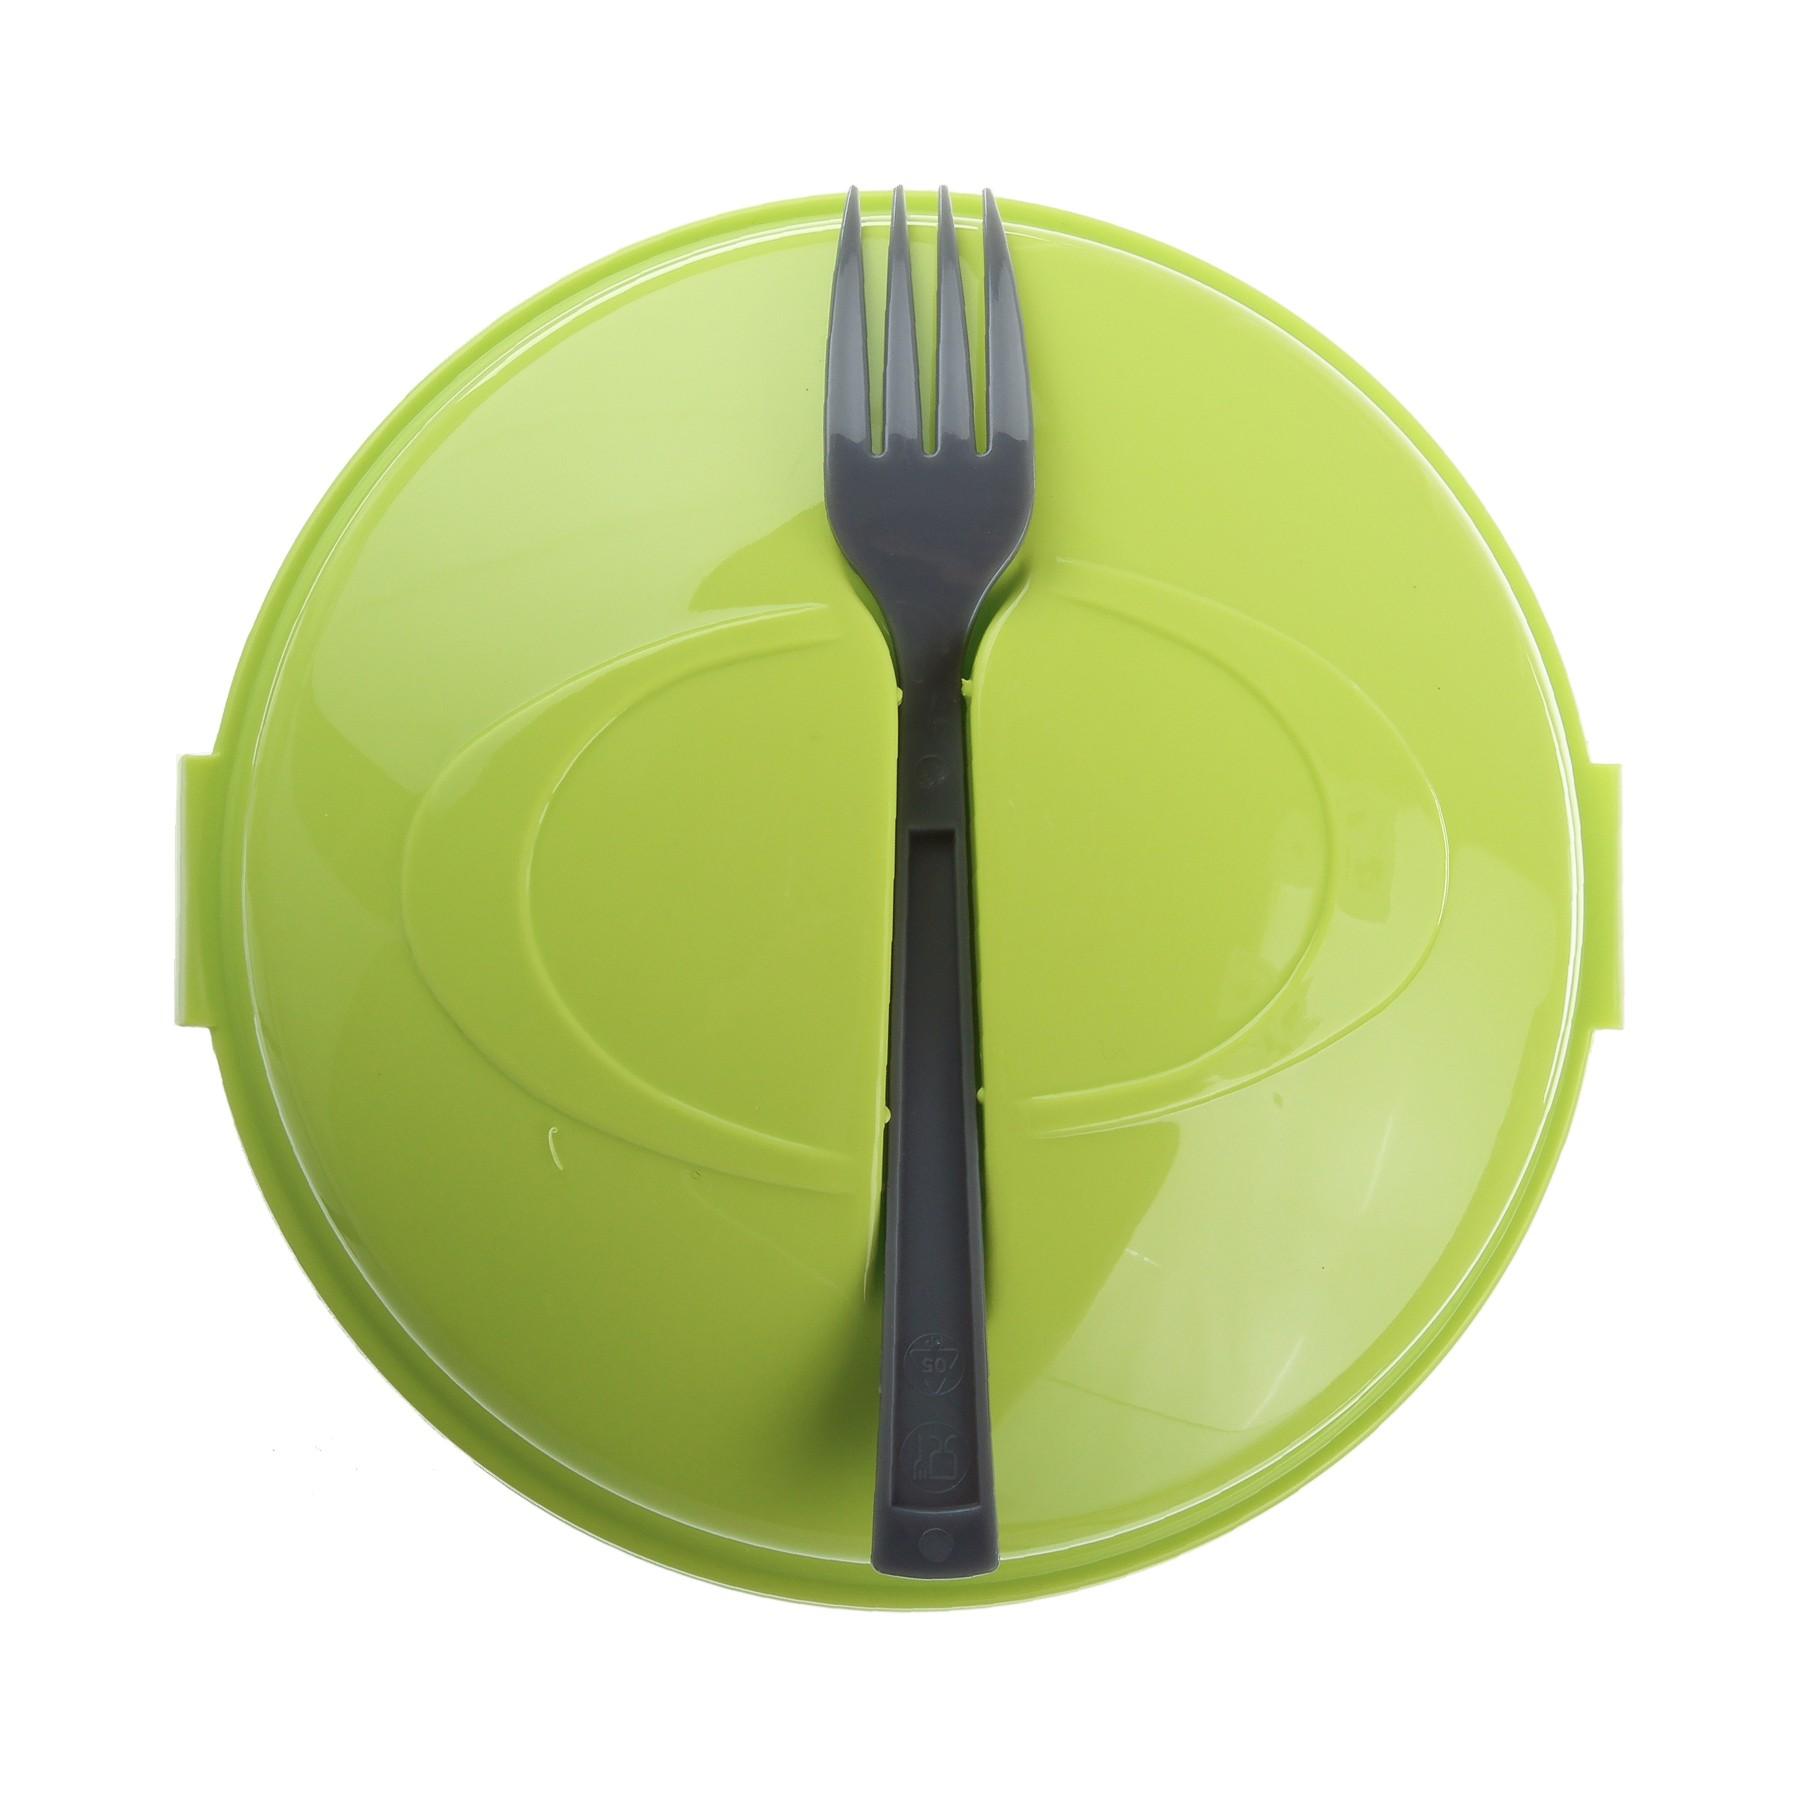 Salat Box mit Gabel, 1,3 L Bild https://cdn03.plentymarkets.com/zsy4vjx32p87/item/images/5038/full/13064-ama-06.JPG